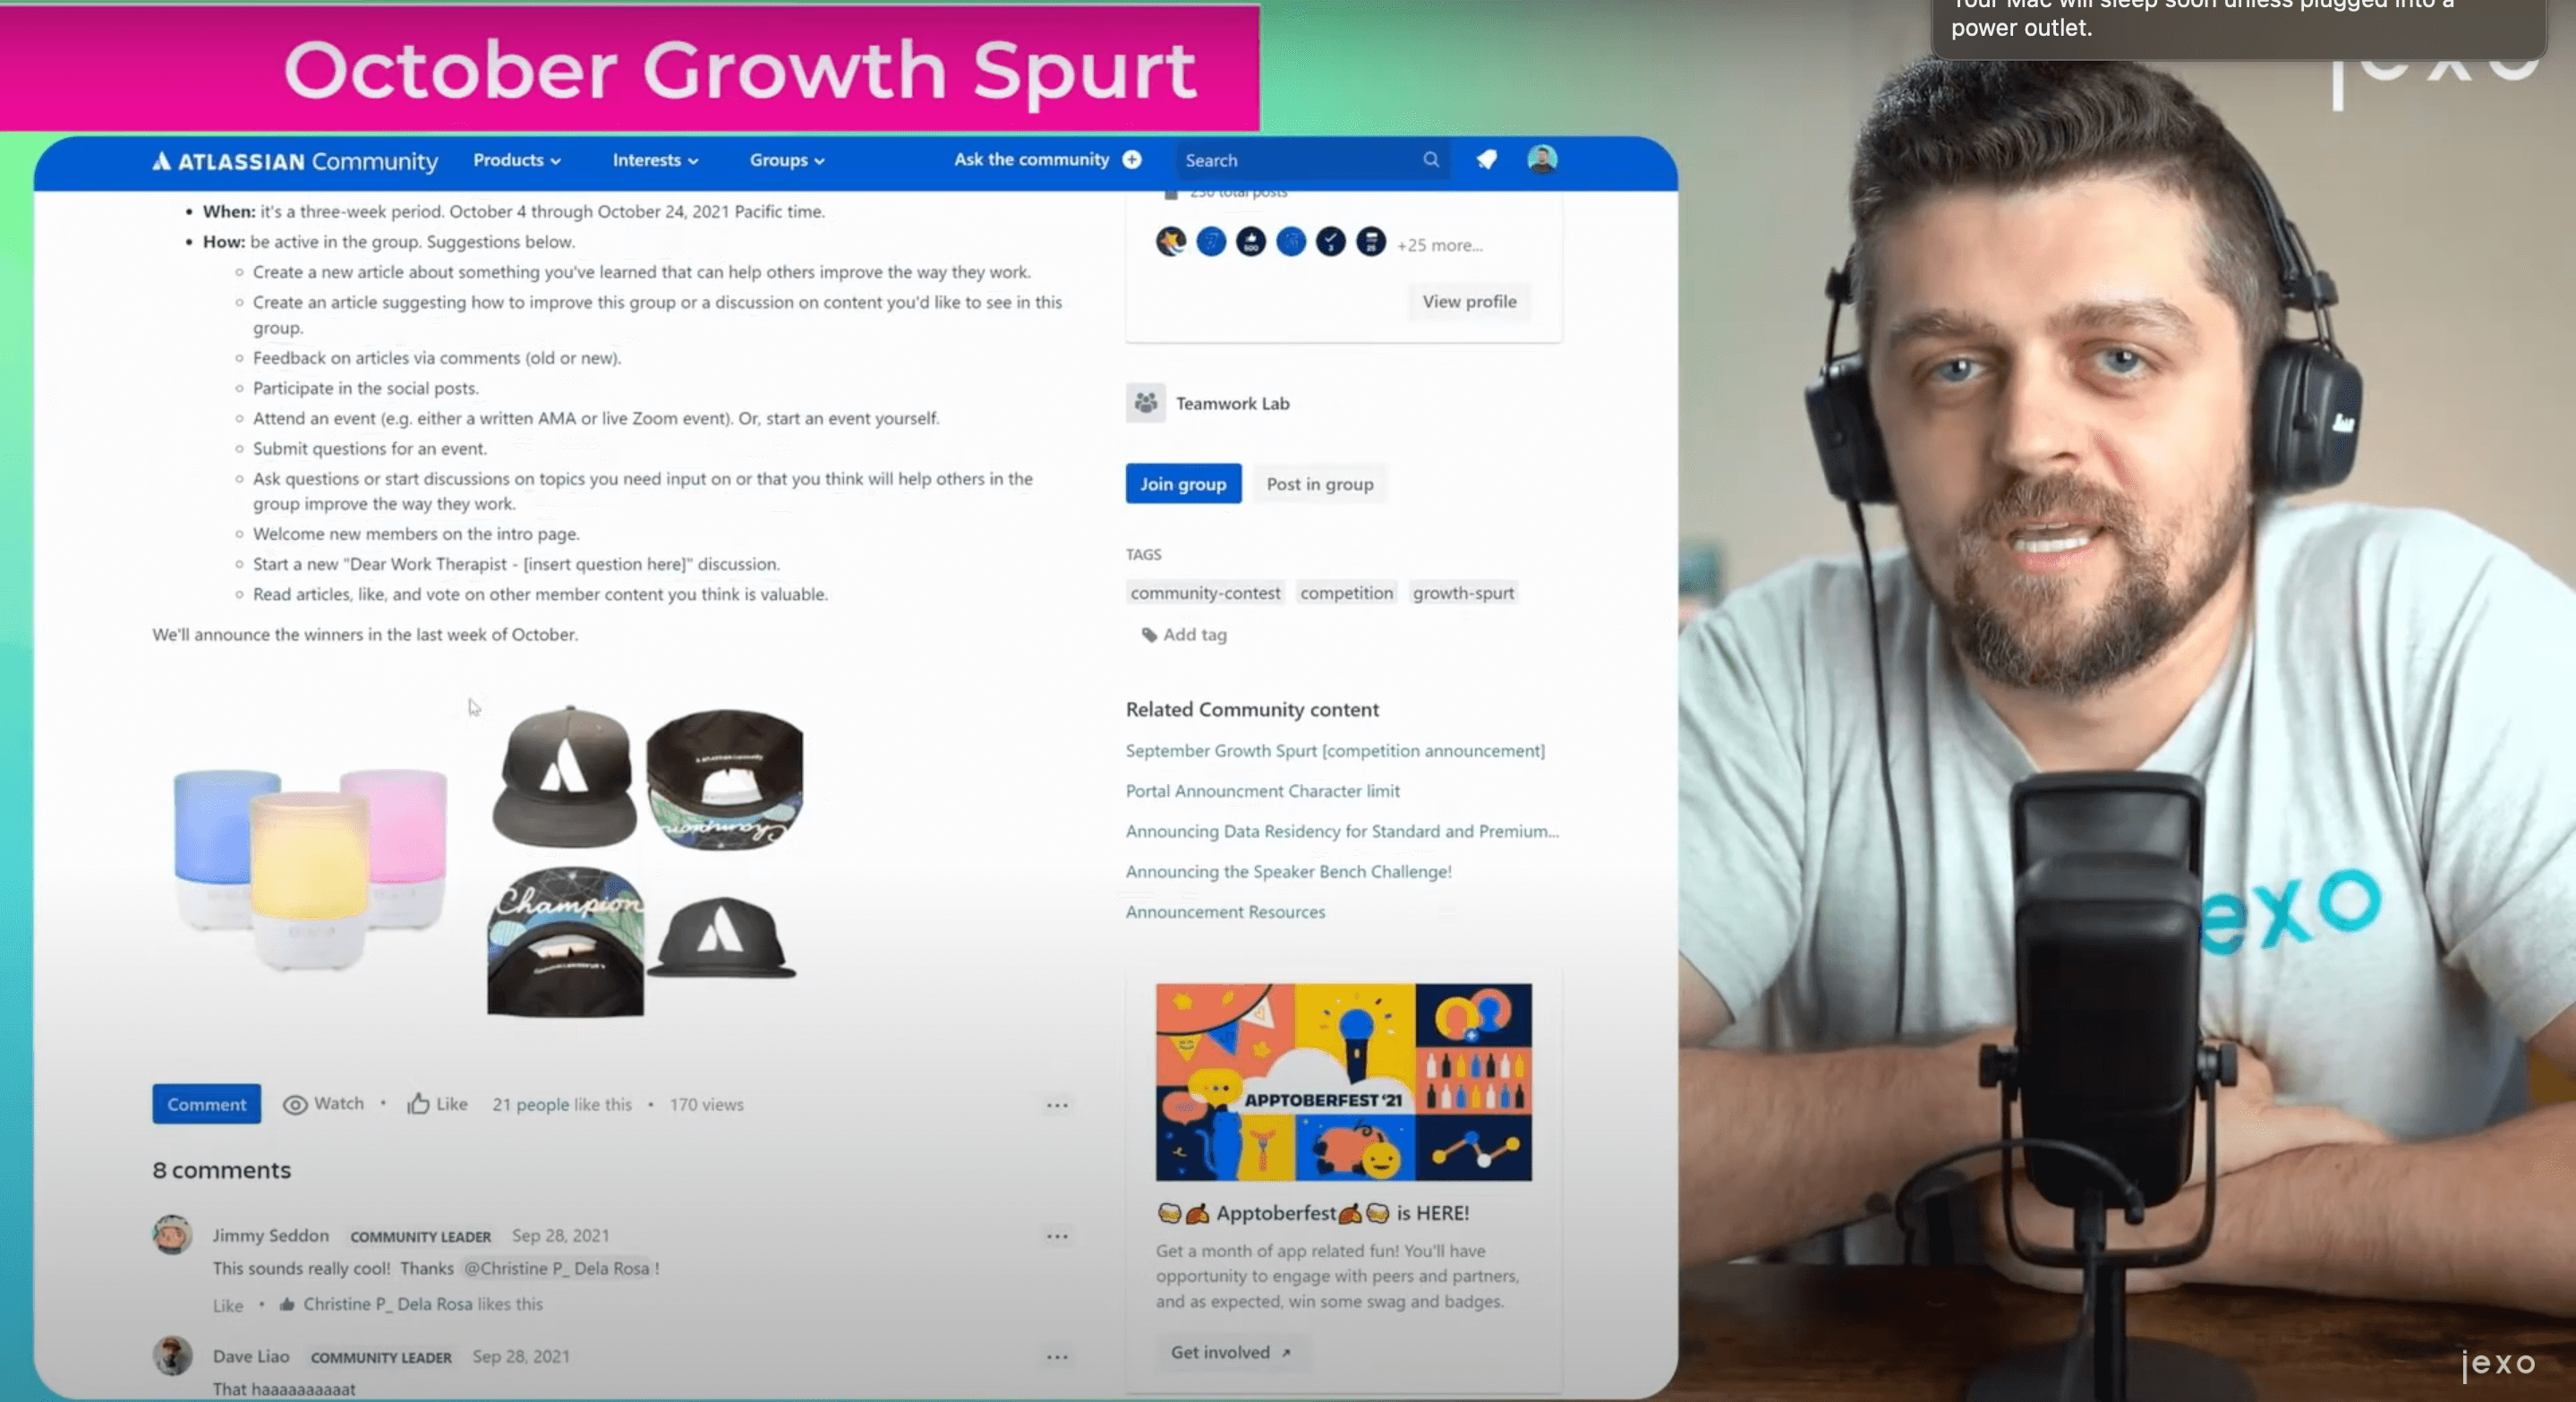 Atlassian news: October Growth Spurt Community event